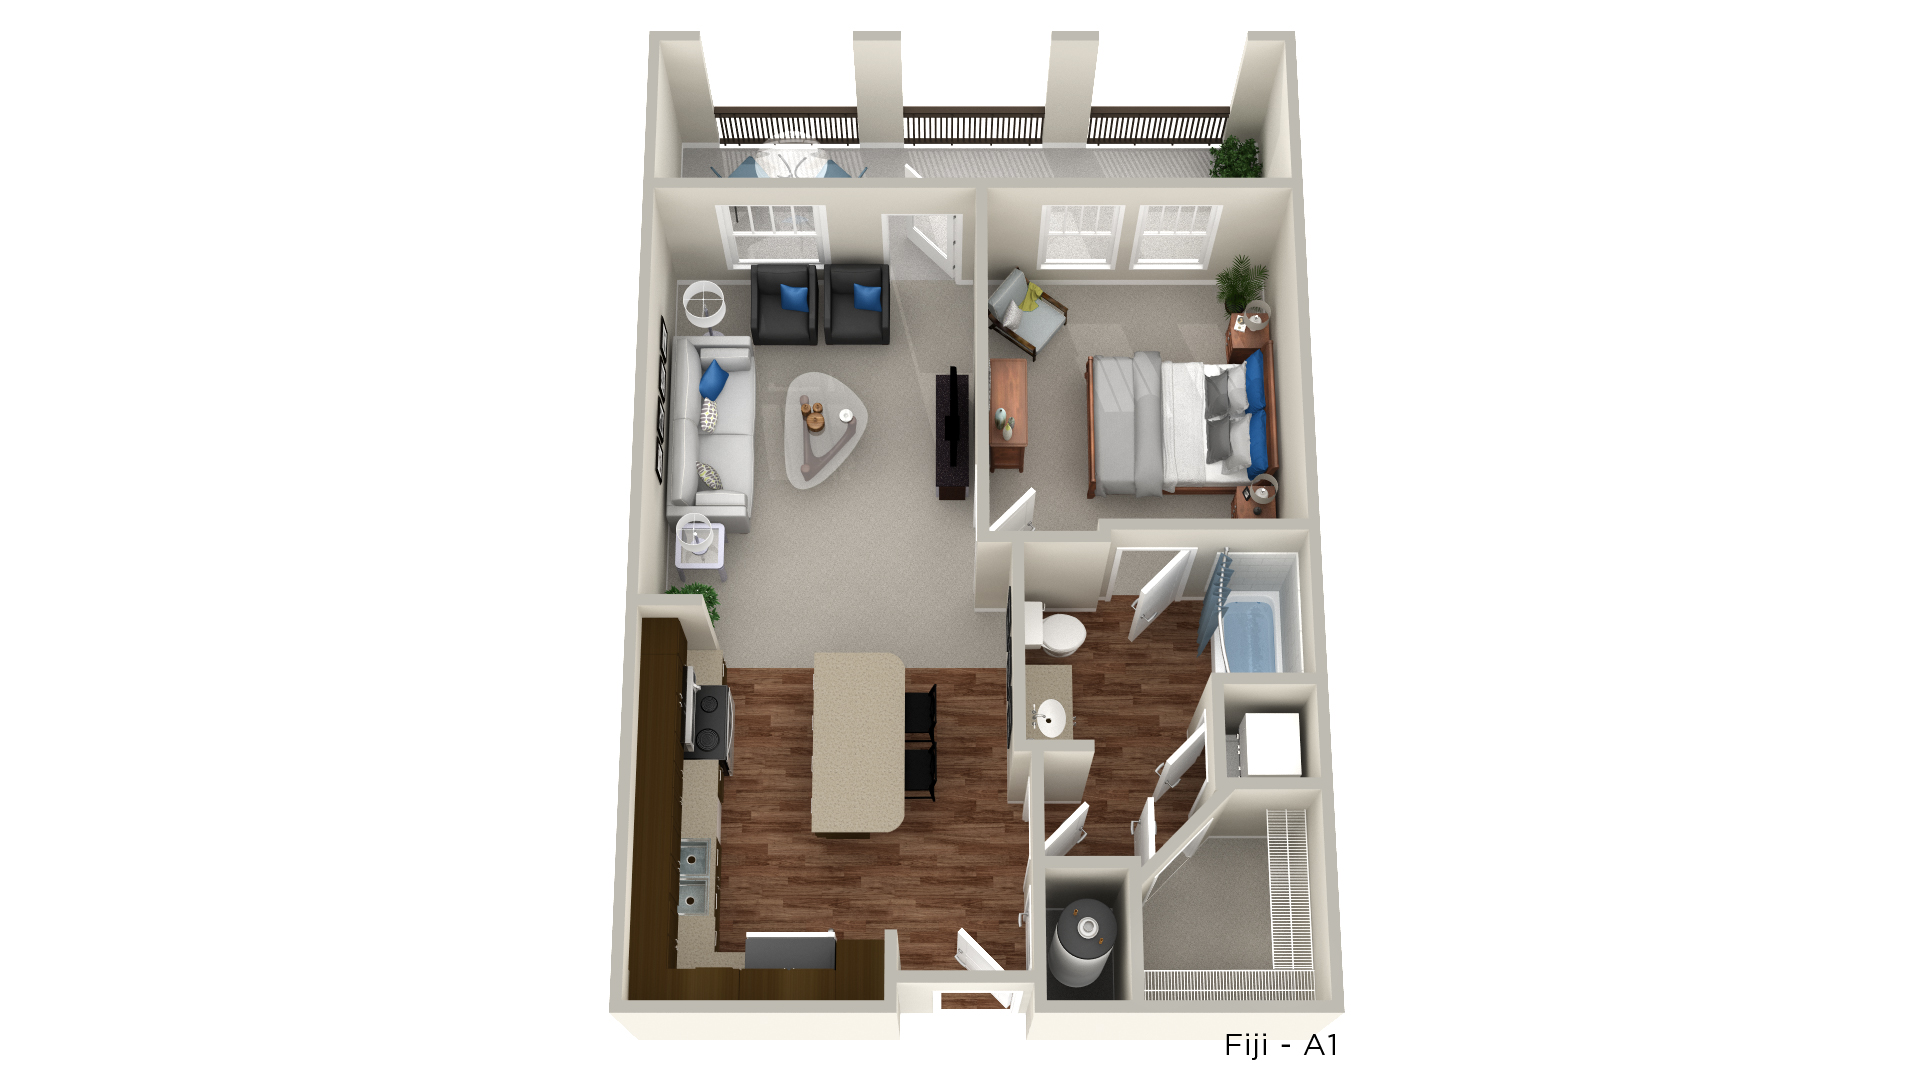 Floorplan - Fiji image